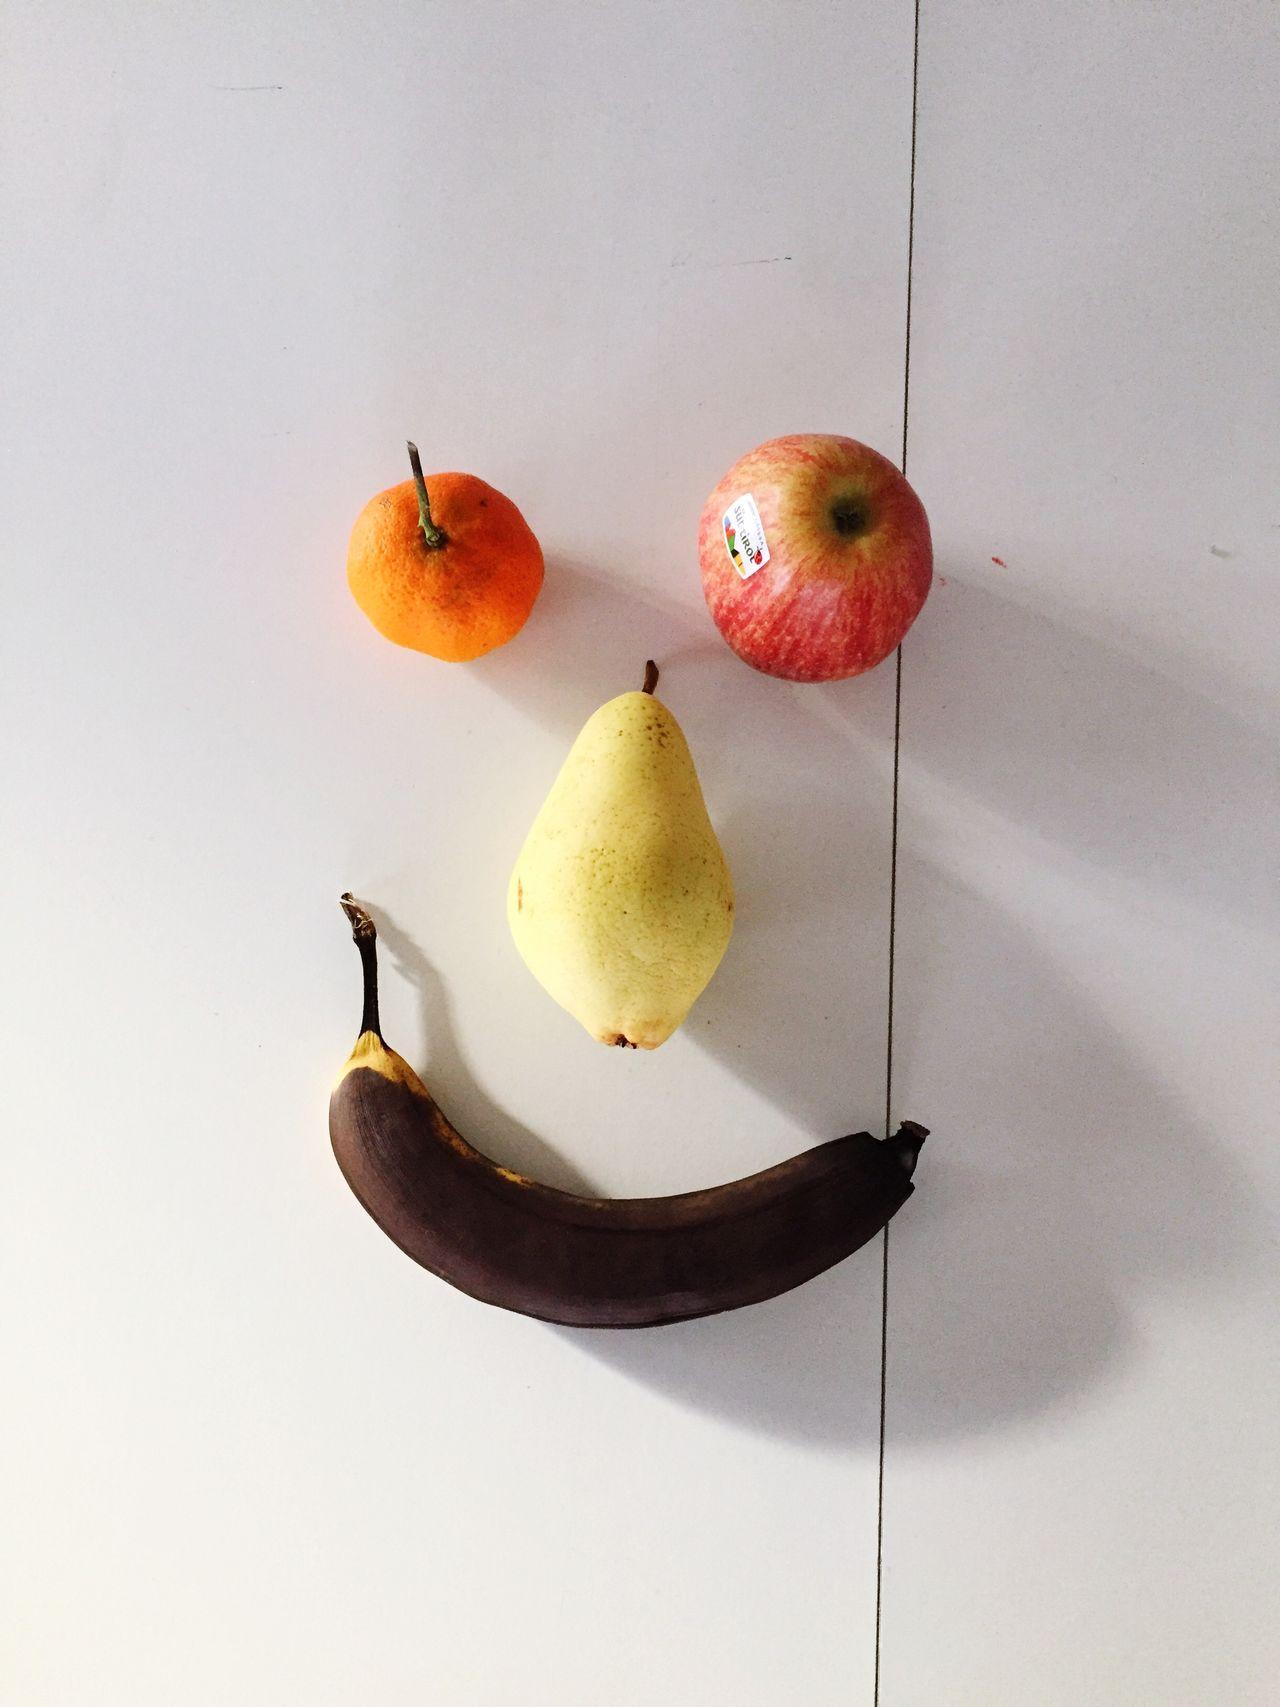 Fruit No People Food Healthy Eating White Background Studio Shot Freshness Banana Pear Apple Orange - Fruit Happy Smile Shadow I See Faces